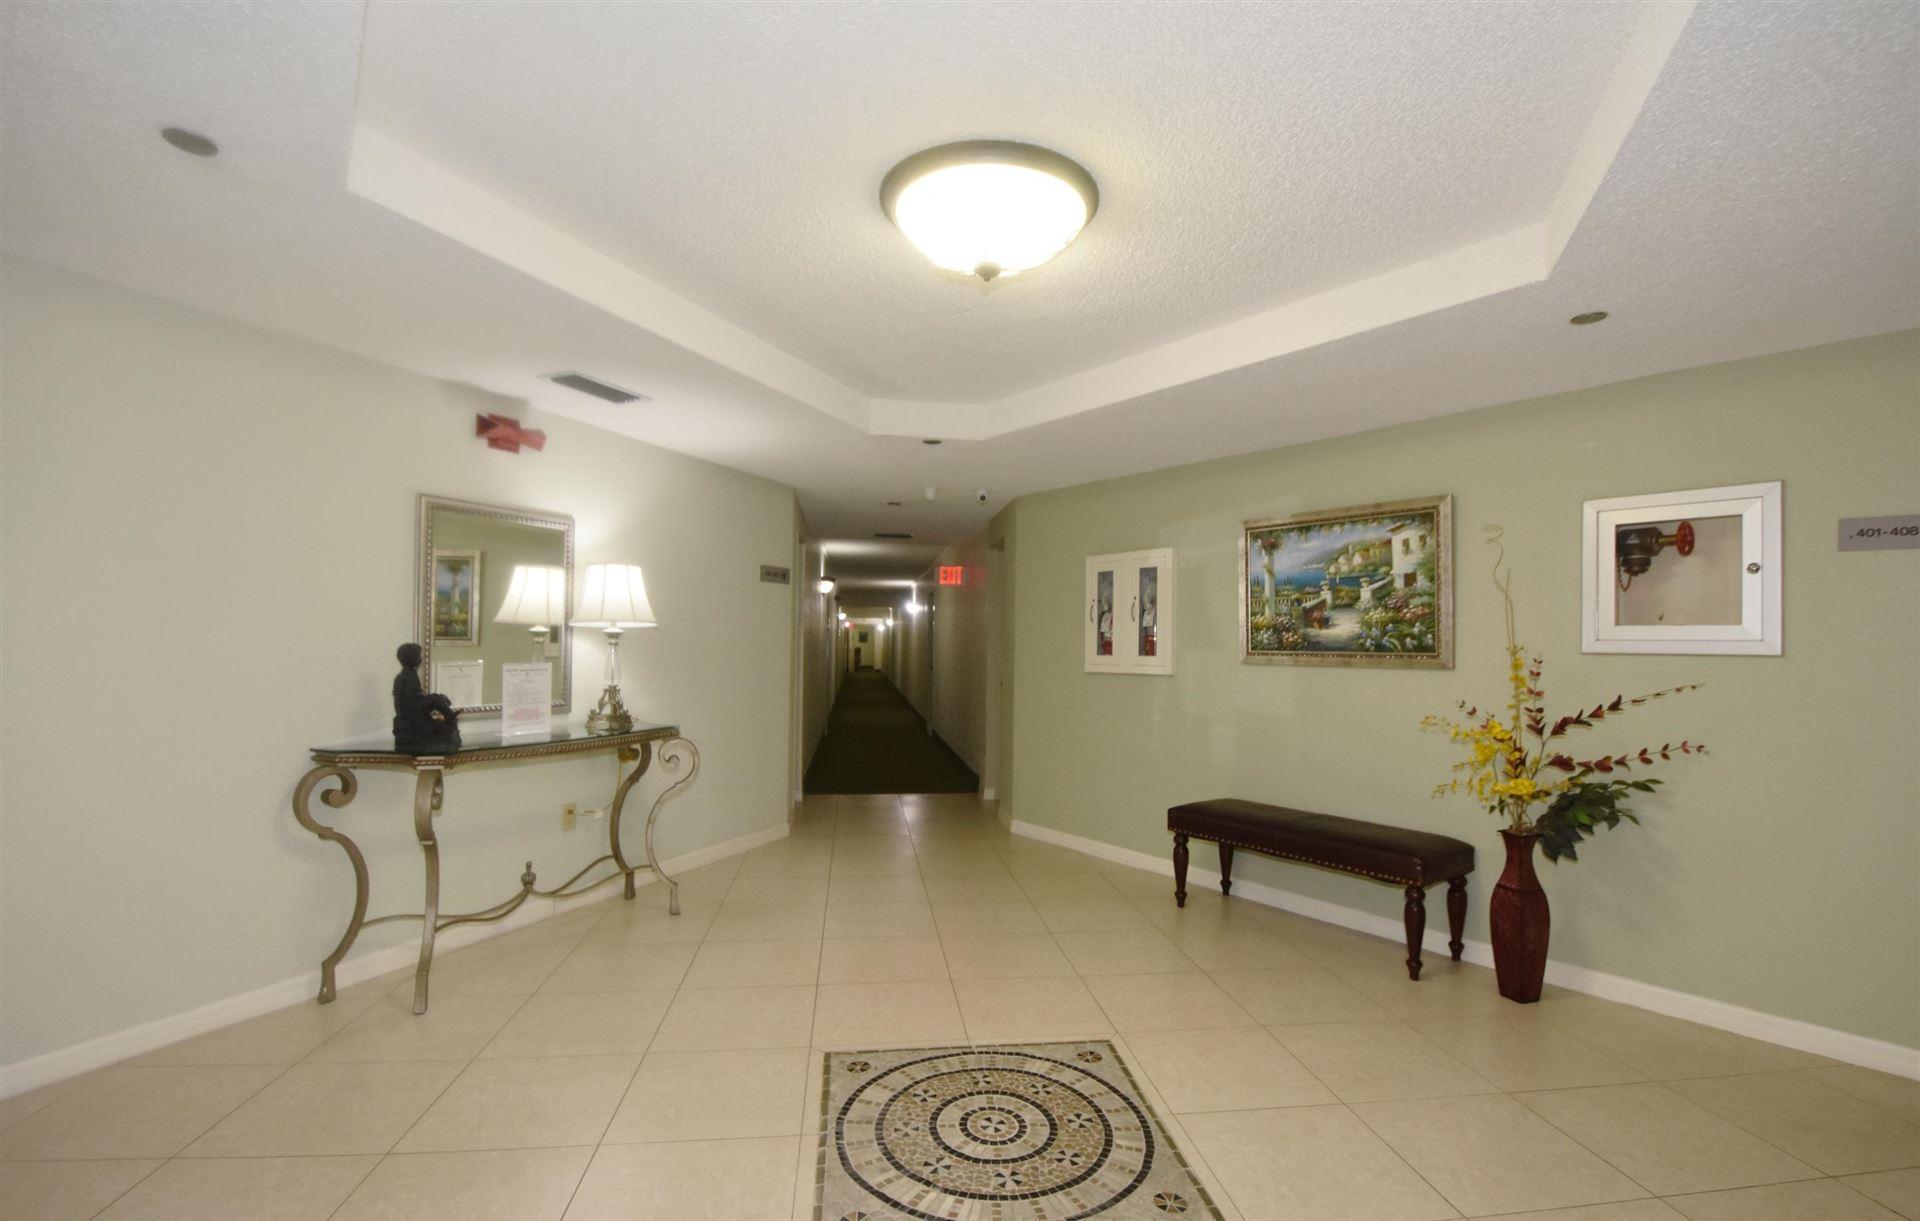 900 Saint Charles Place #418, Pembroke Pines, FL 33026 - MLS#: RX-10713592